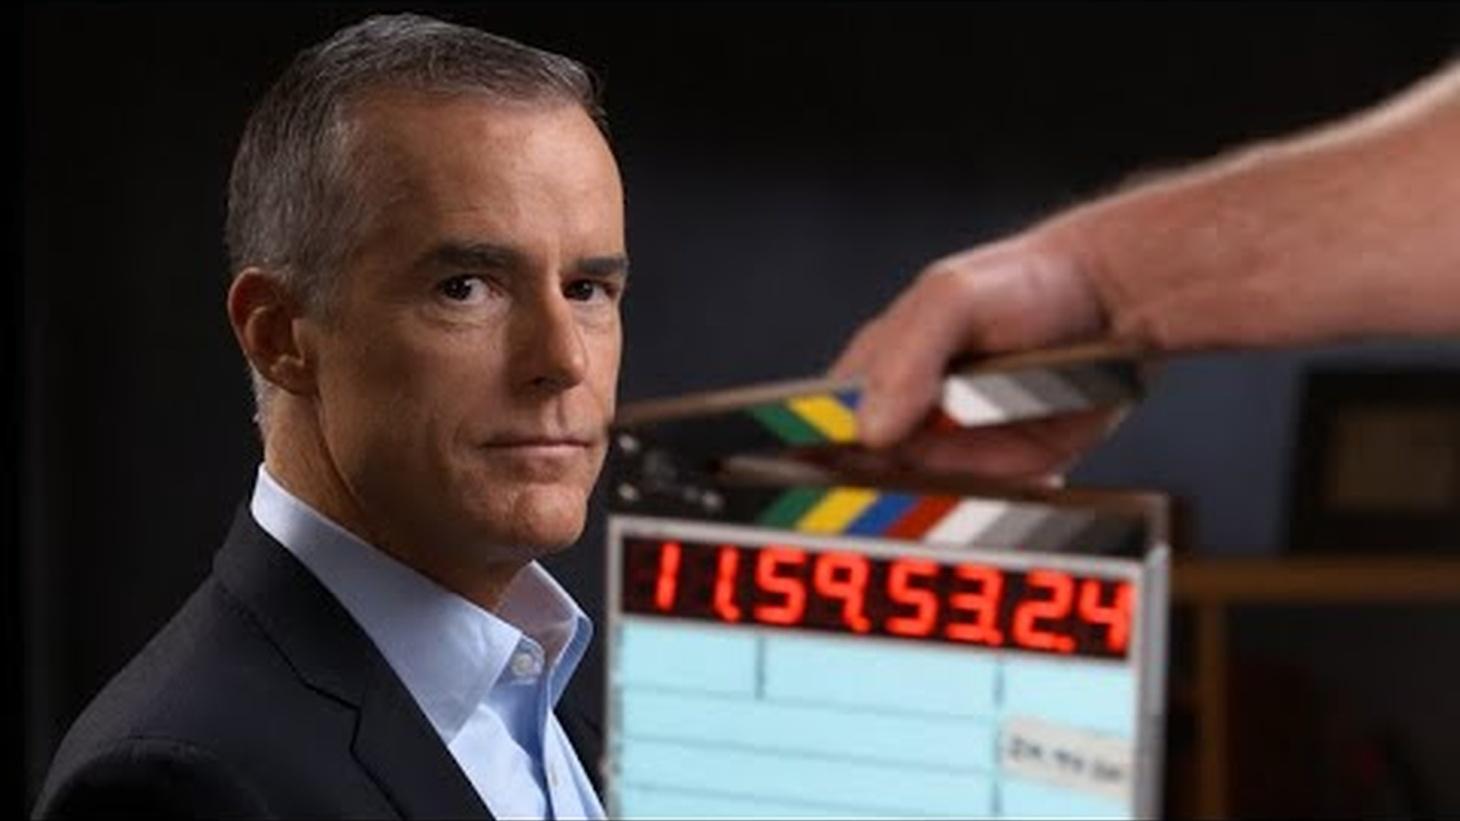 Andrew McCabe on 60 Minutes